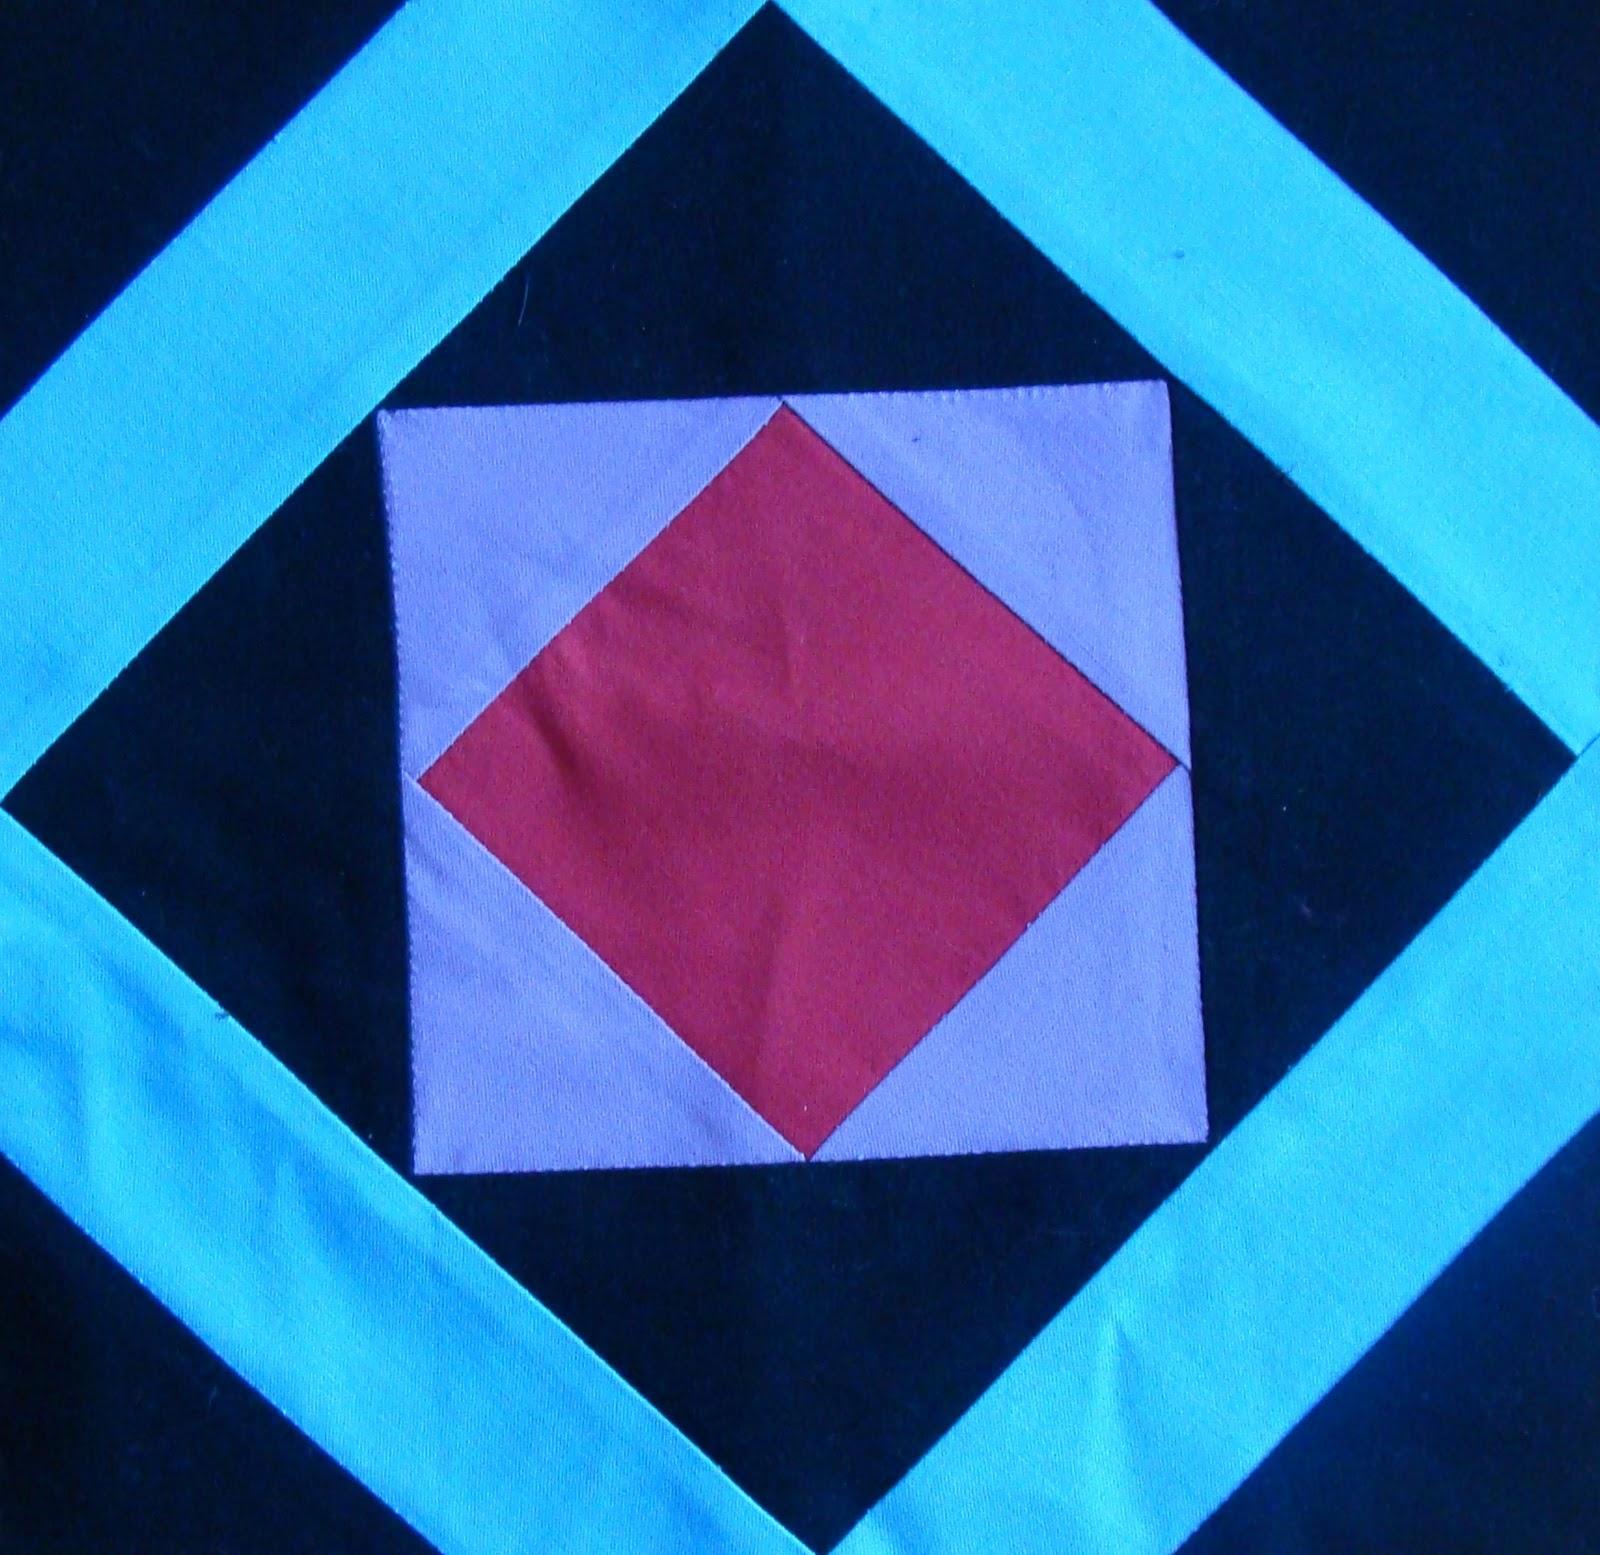 Amish Quilts Patterns Free Joy Studio Design Gallery - Best Design